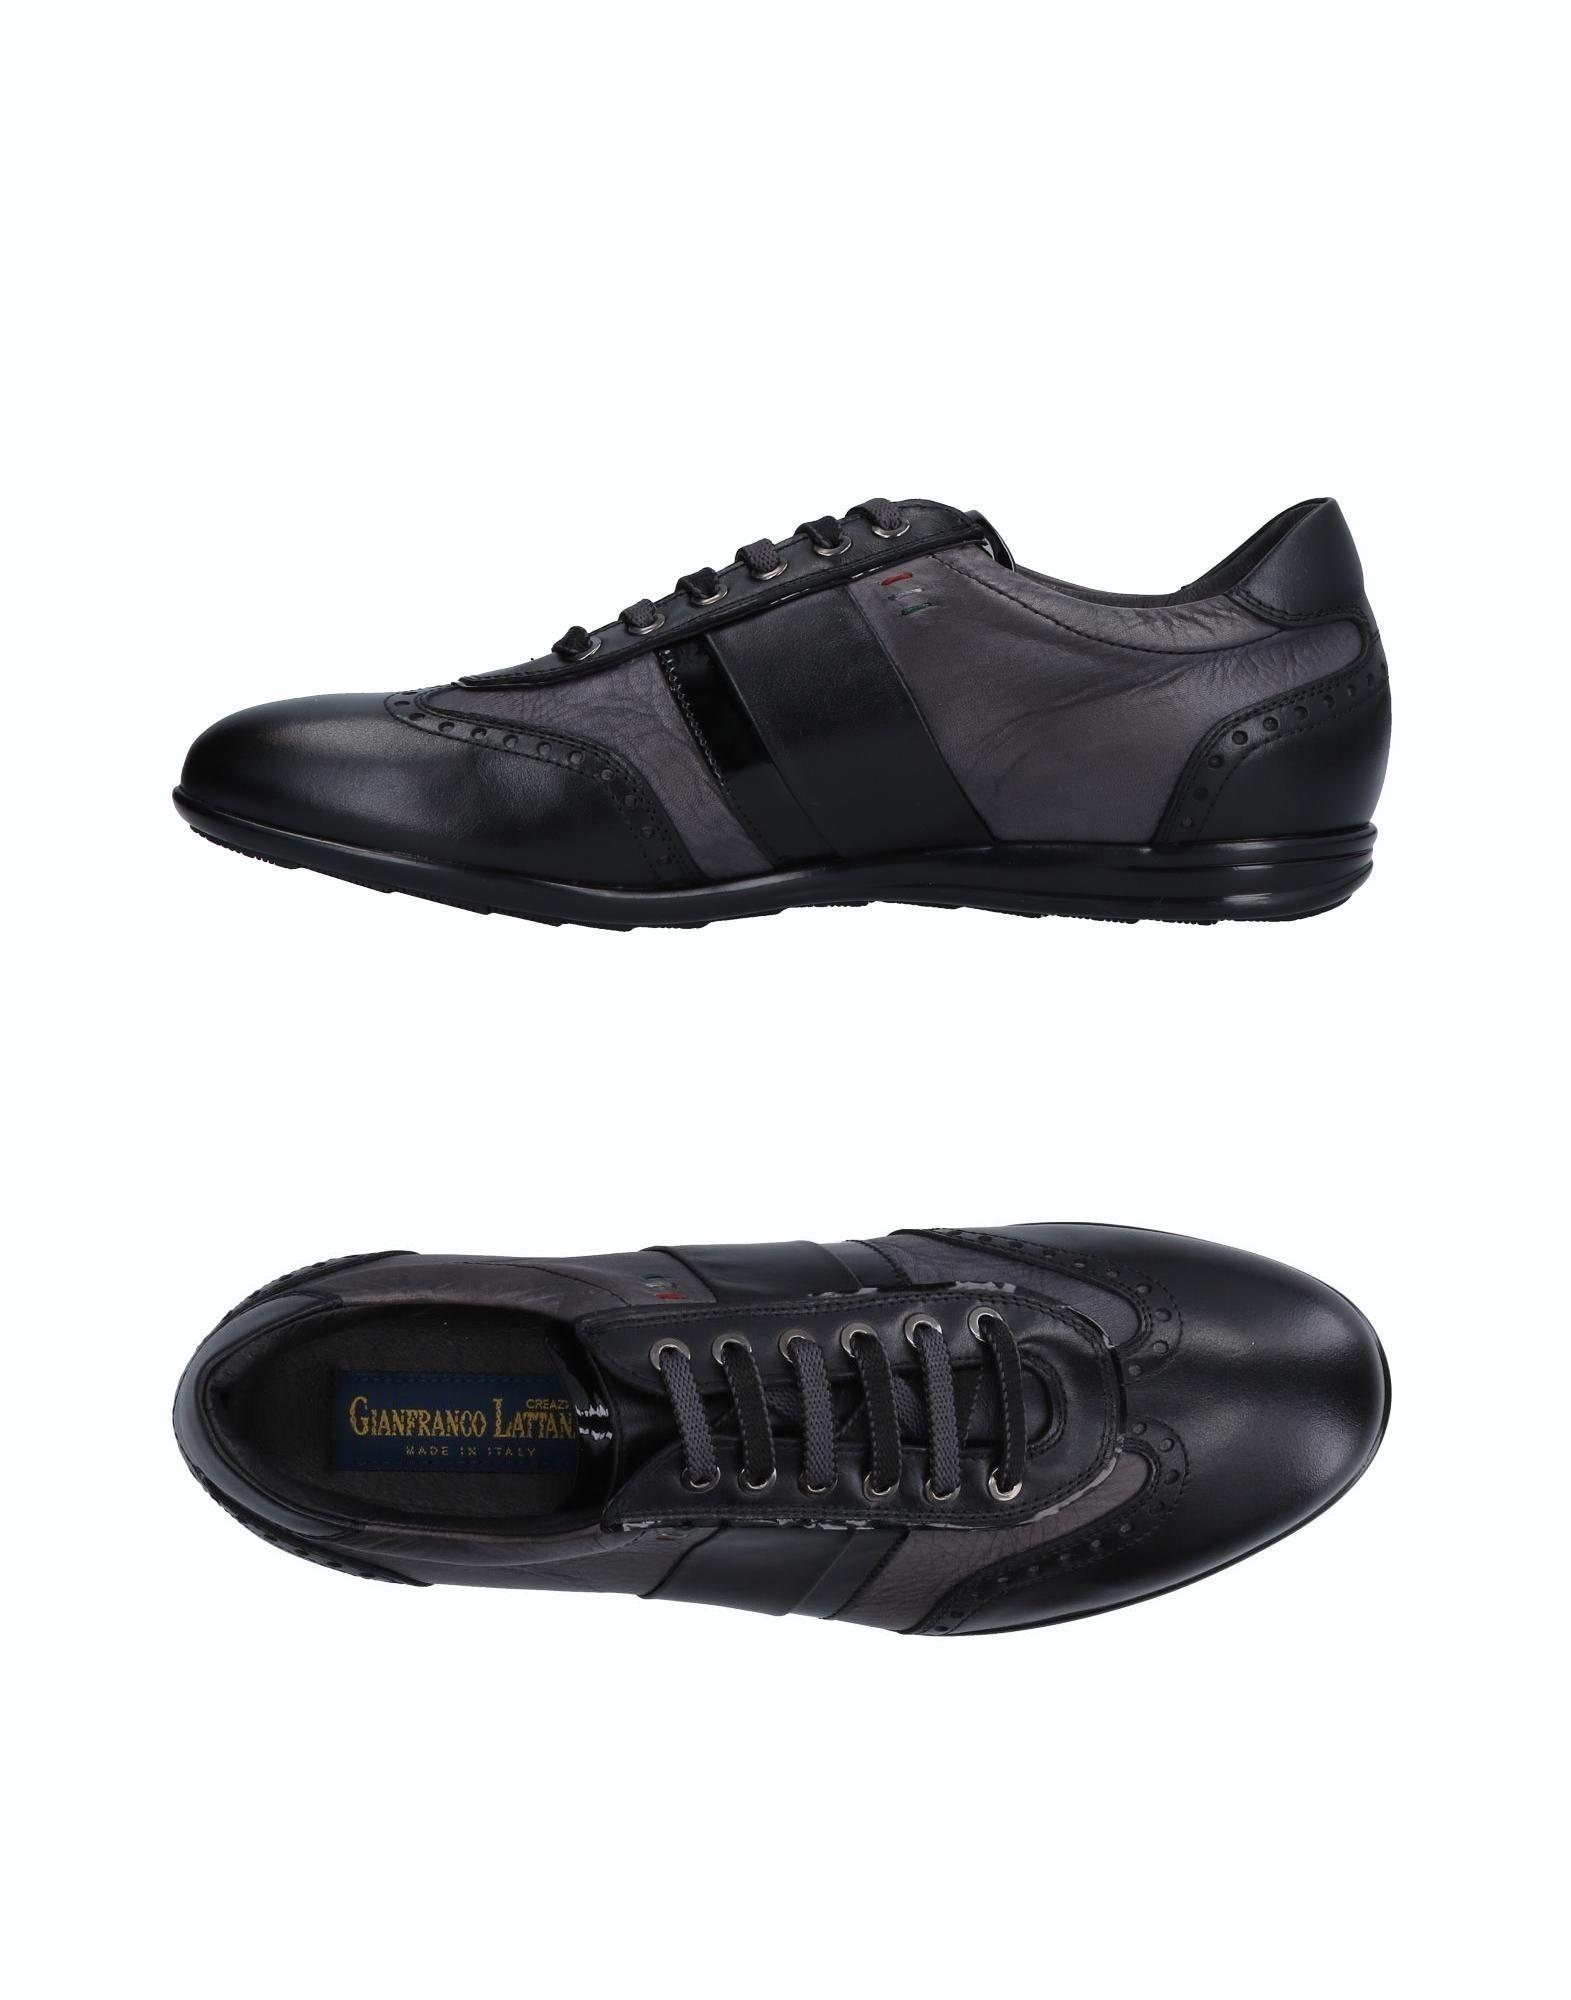 Gianfranco Lattanzi Sneakers Herren  11513114XP Gute Qualität beliebte Schuhe